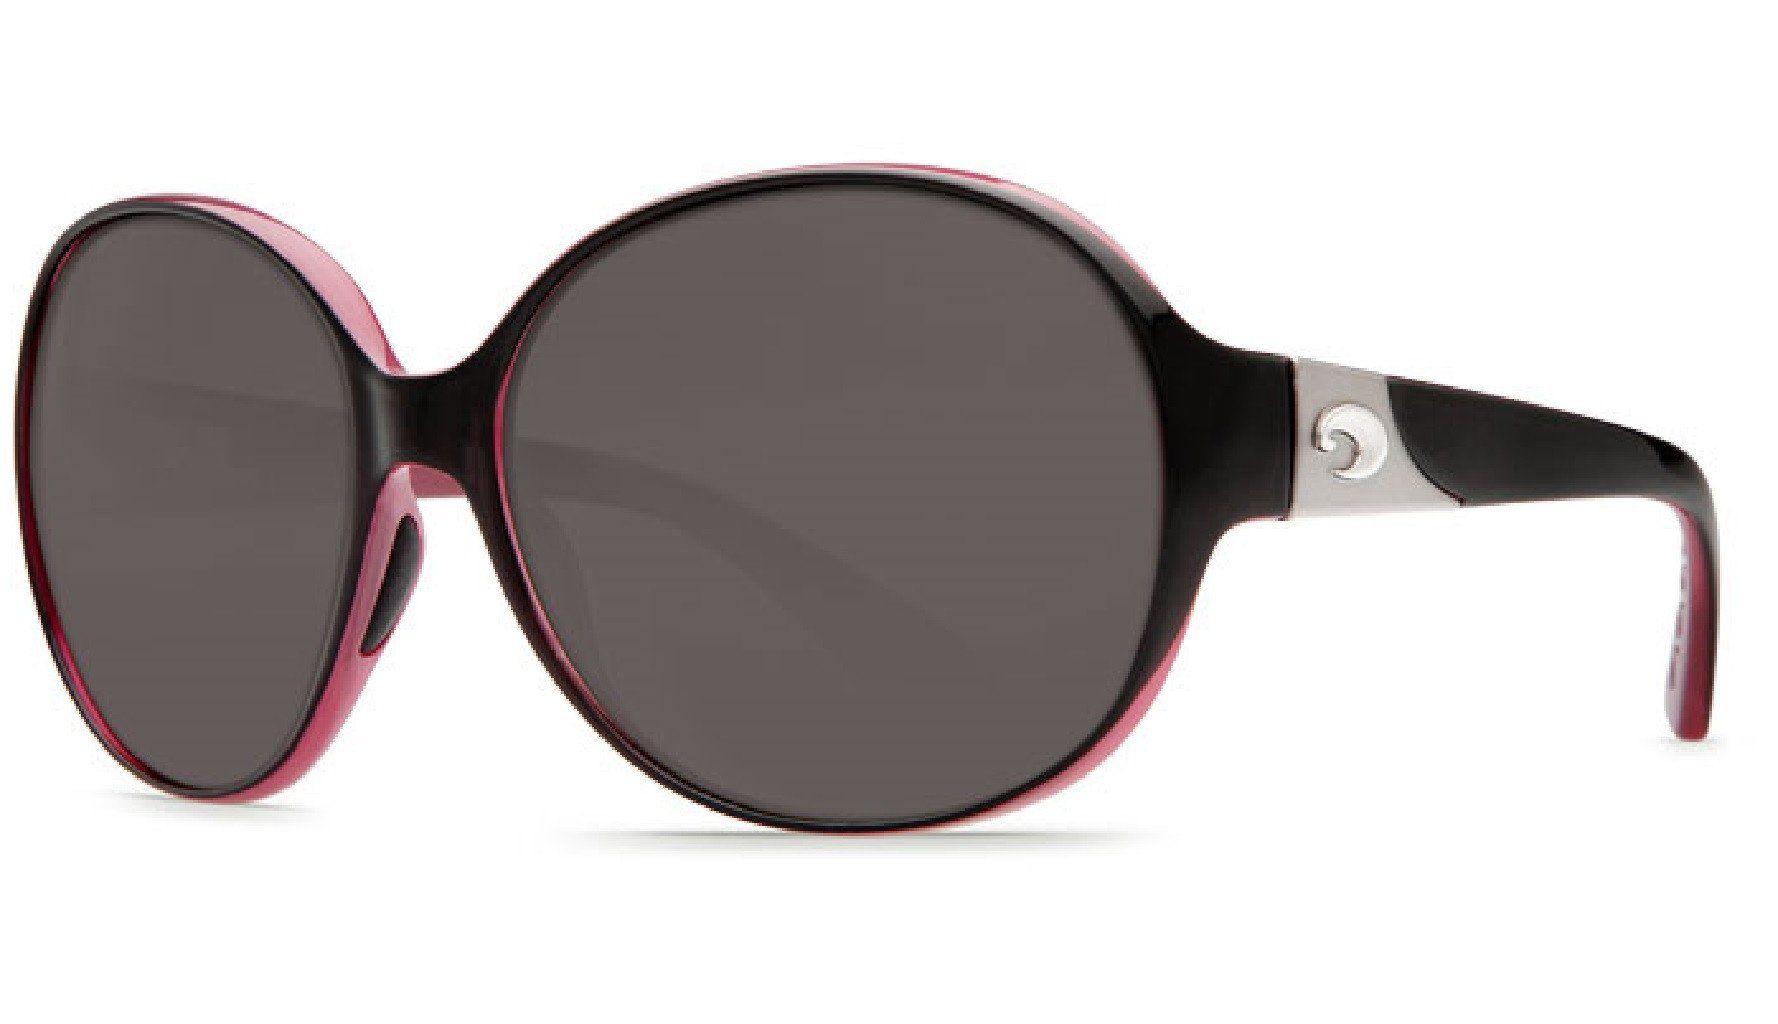 Costa Blenny BY 32 OGP Sunglasses Sunglasses, Sunglasses